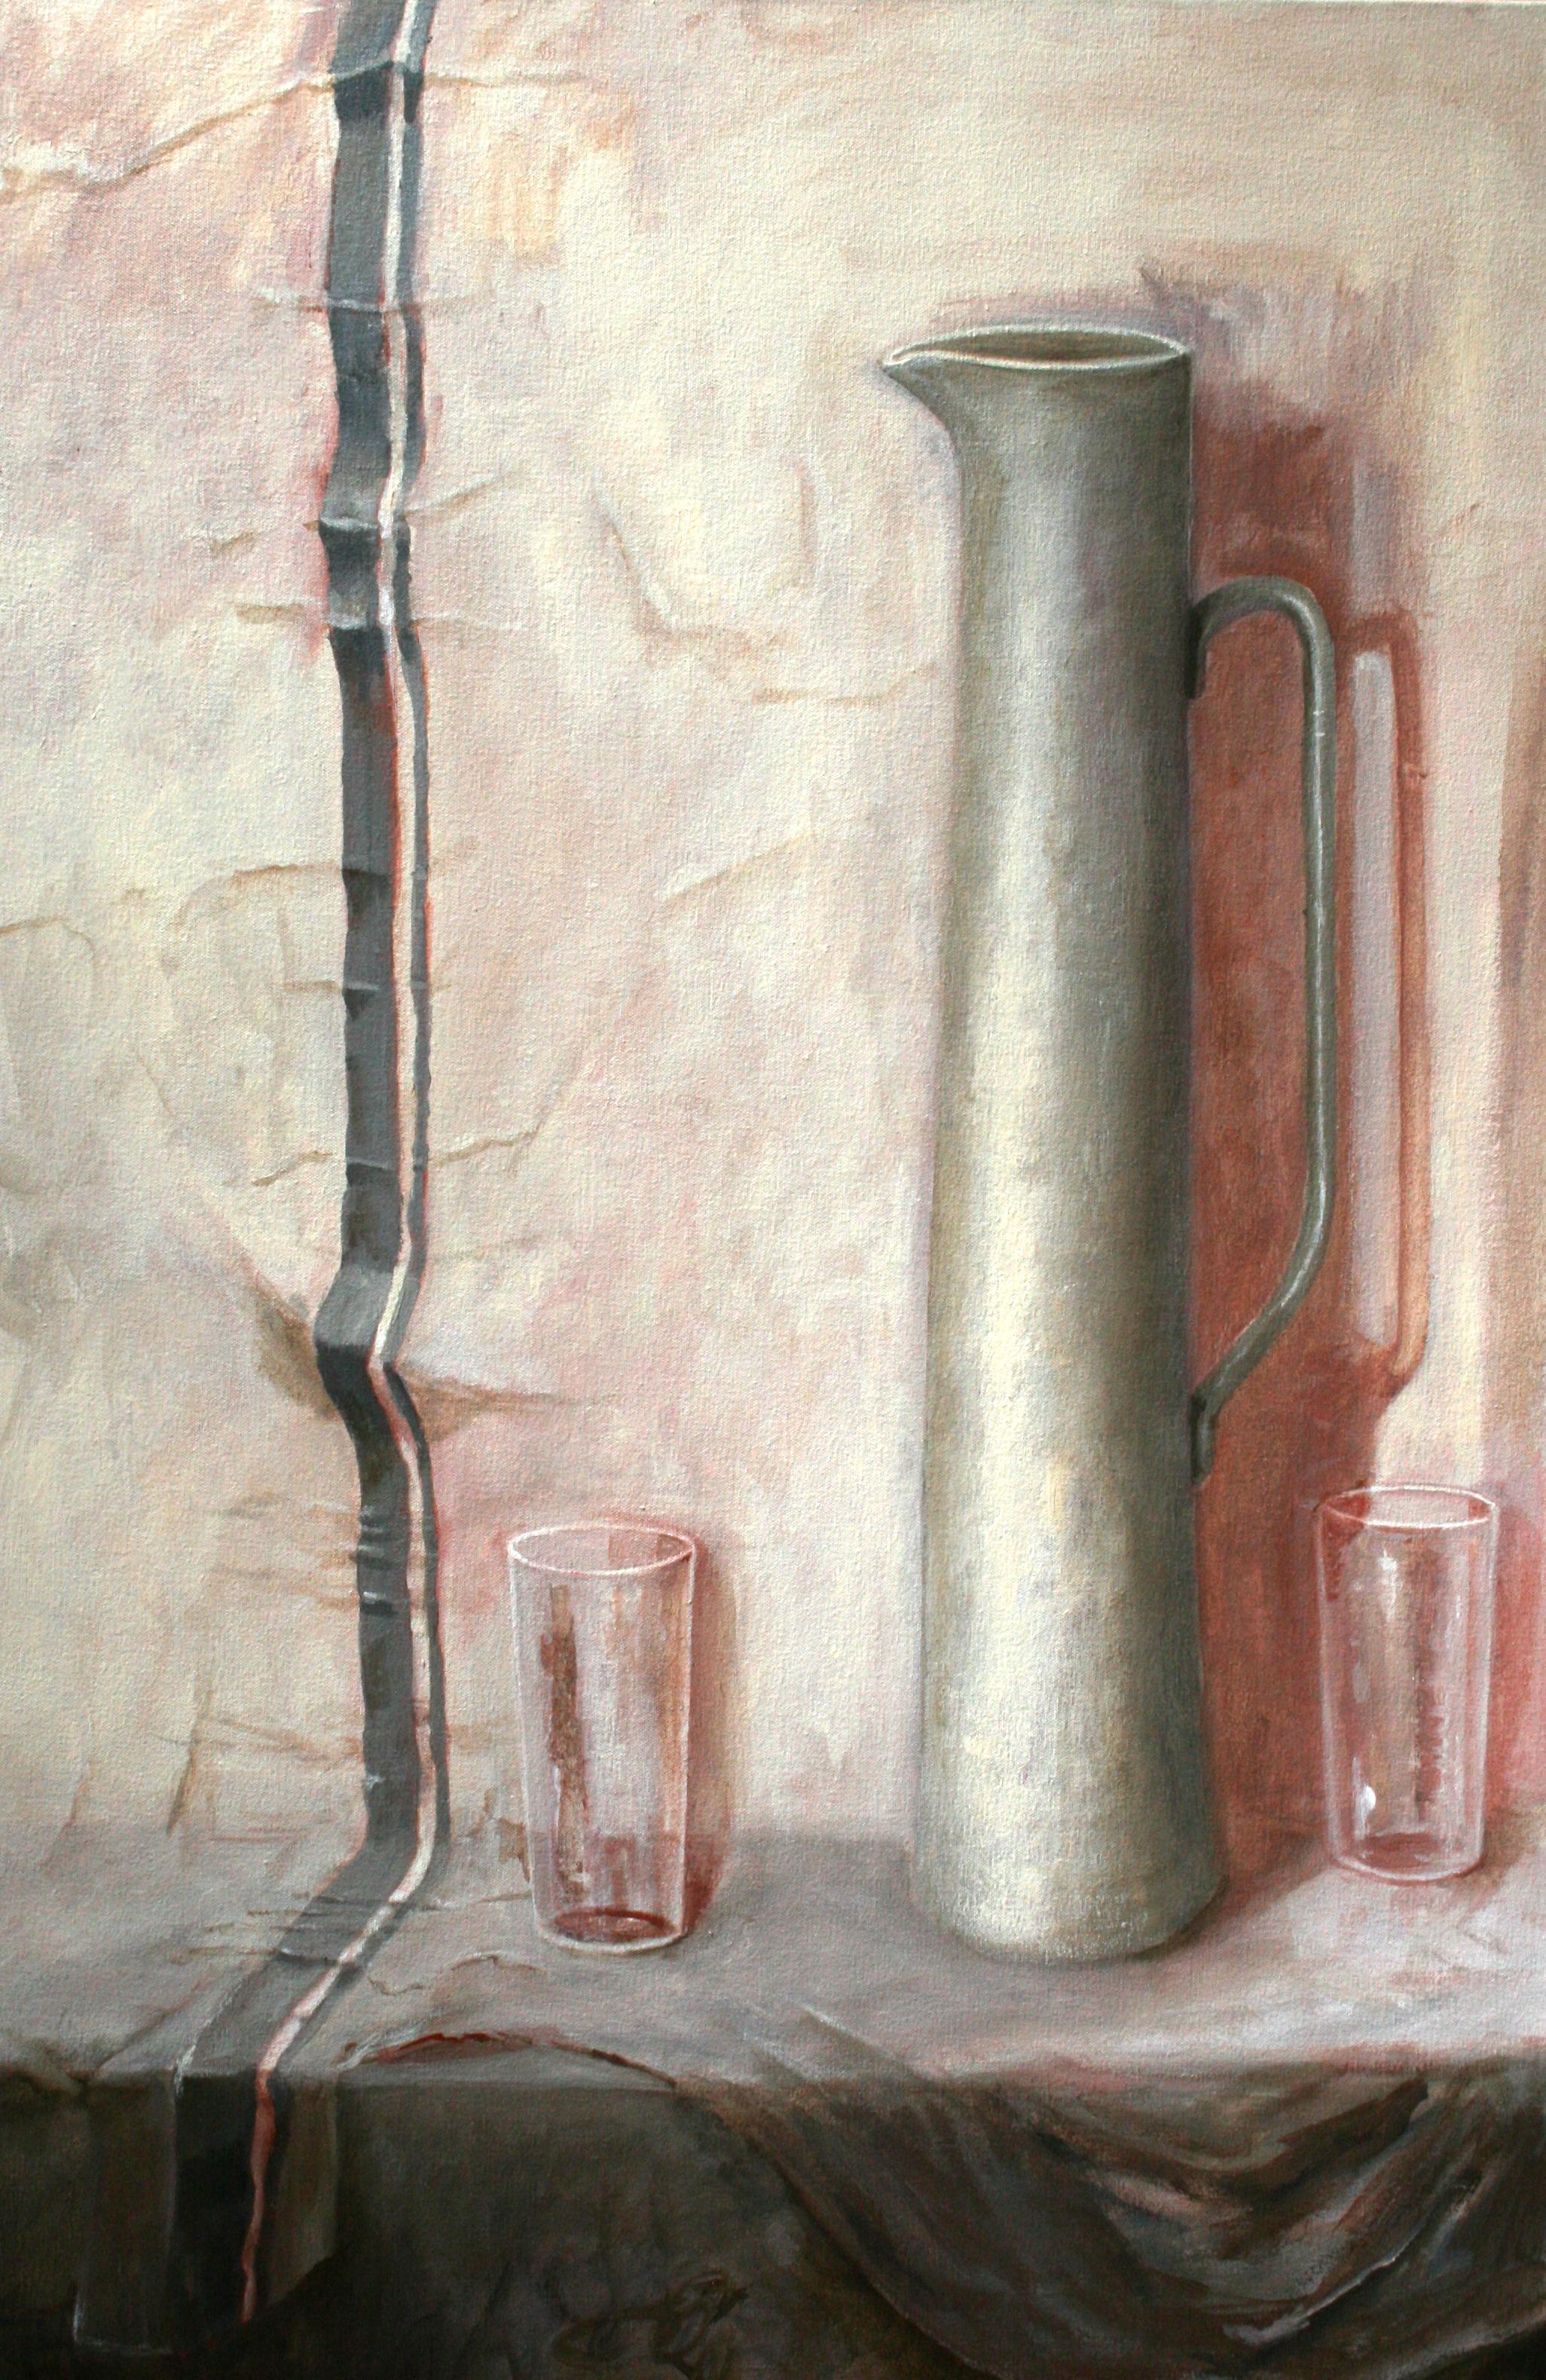 Still life with jug - Lesley Dickman